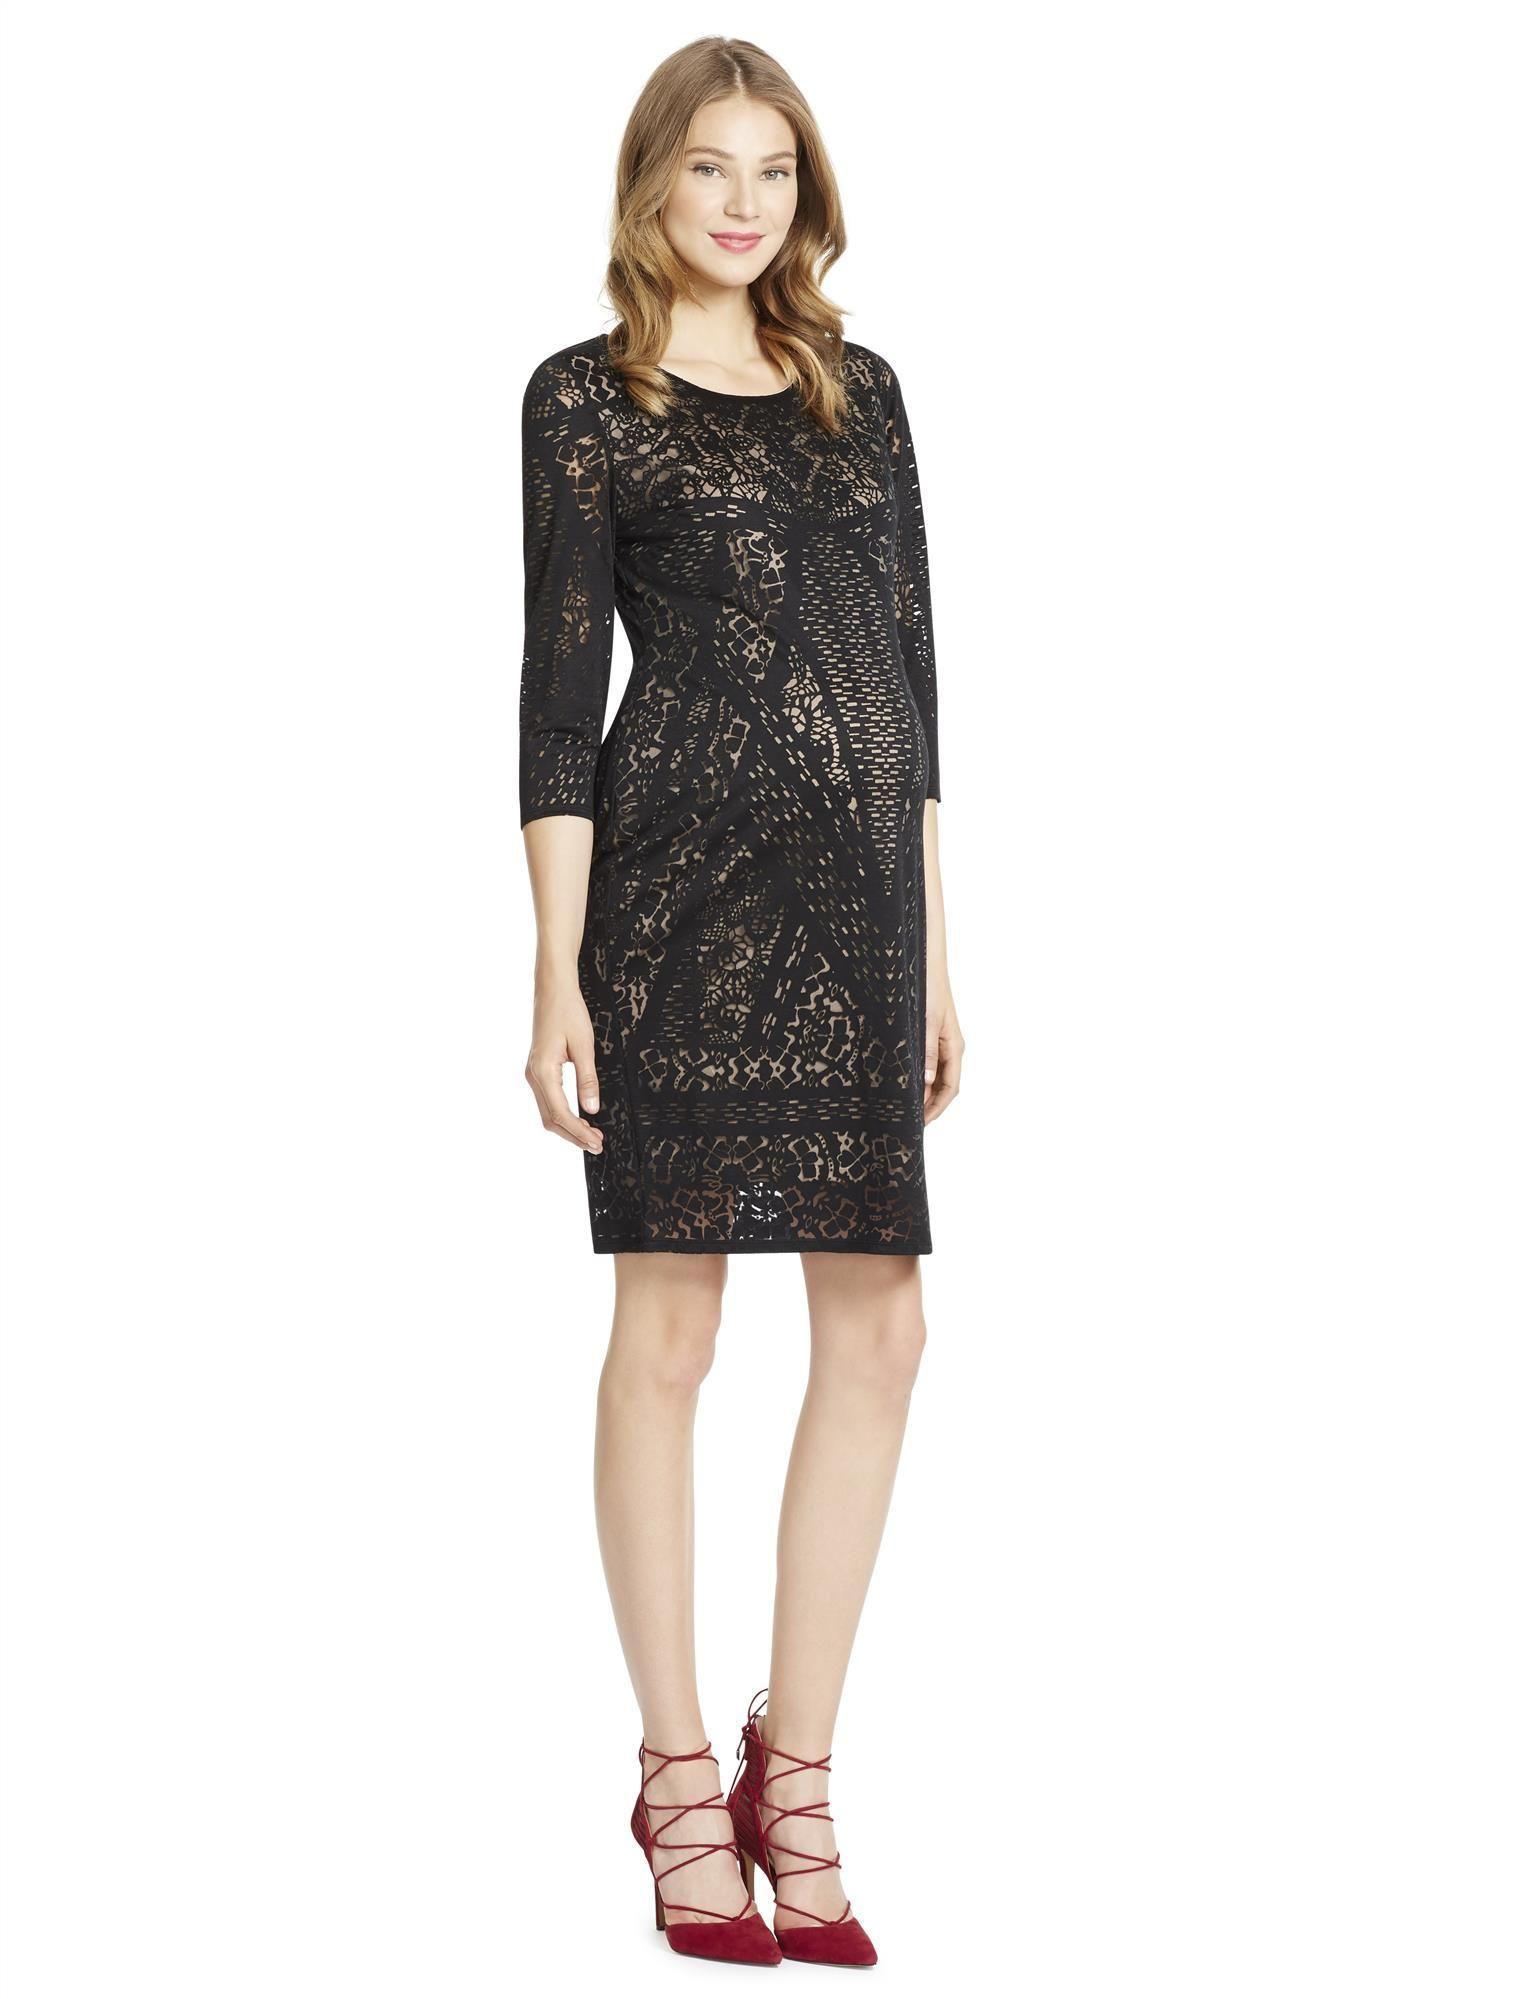 9f3d6f7ed1d -Jessica Simpson Burnout Maternity Dress #jessicasimpson #fashions Classic  Plaid Belted Maternity Shirt Dress